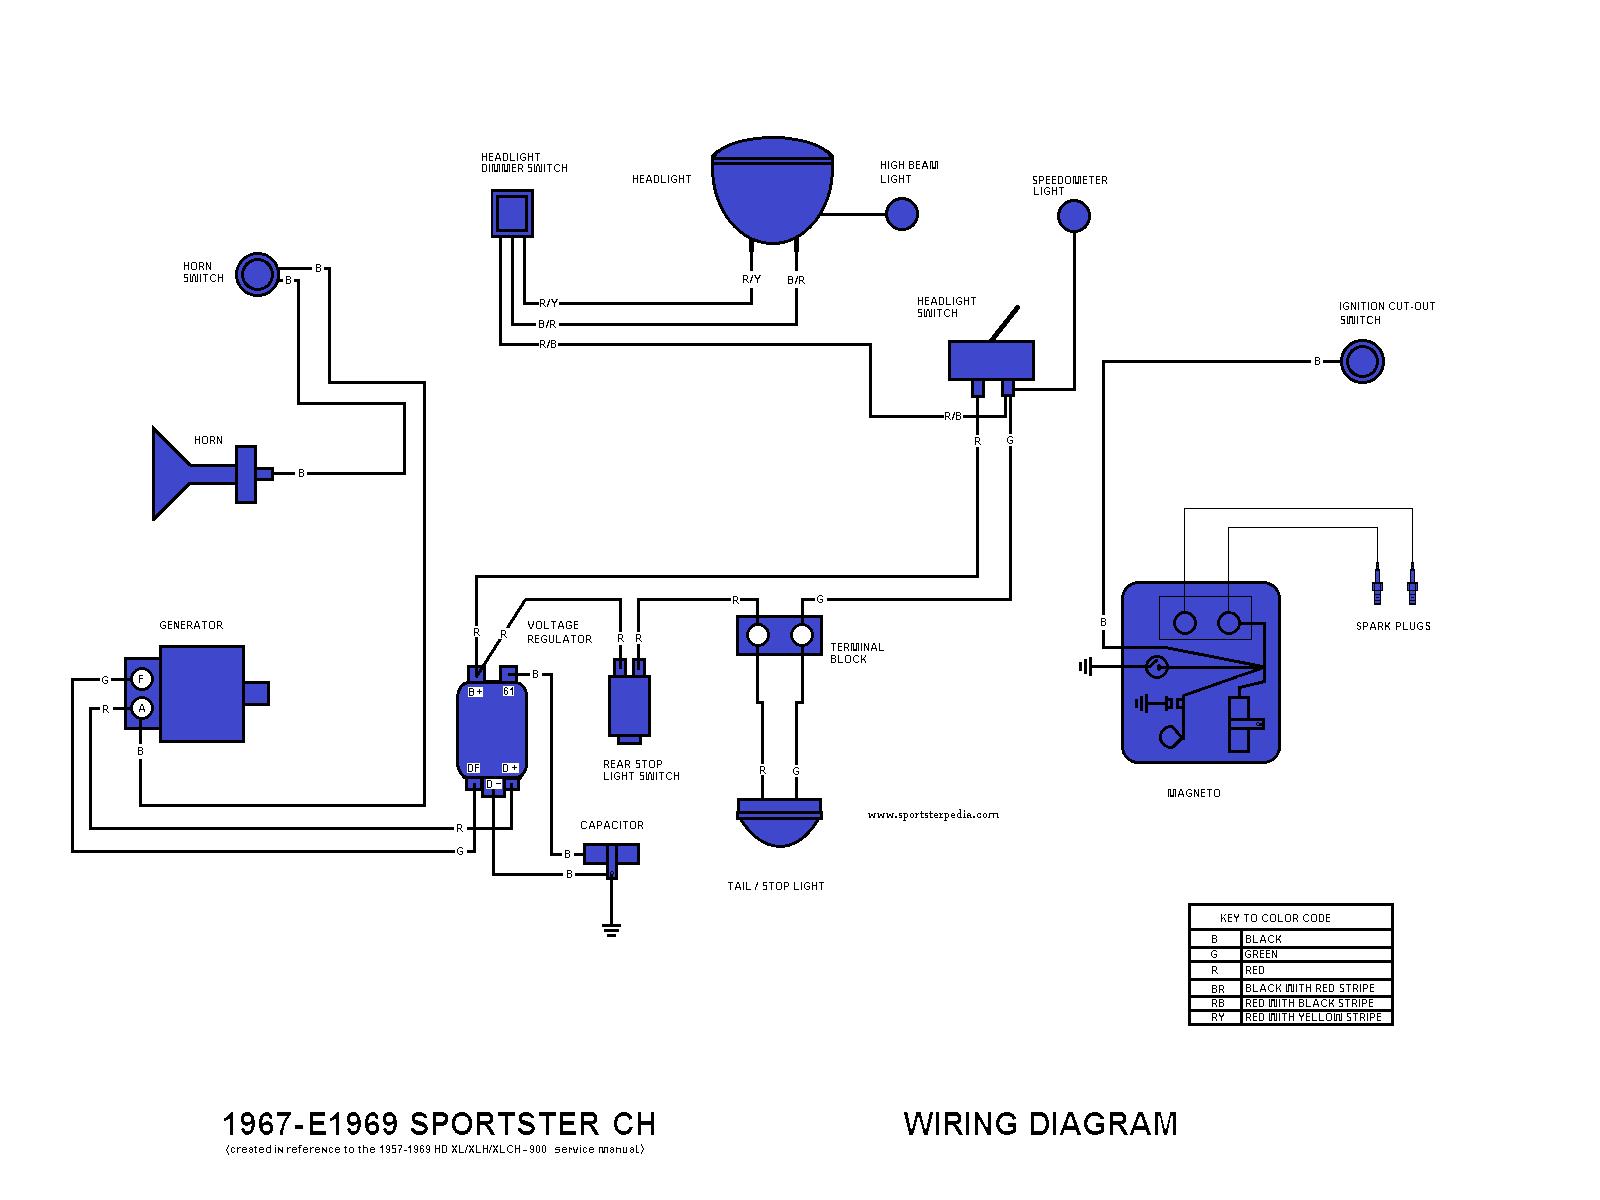 Harley 1968 Xlch Wiring Diagram 1982 Ford F150 Wiring Diagram For Wiring Diagram Schematics